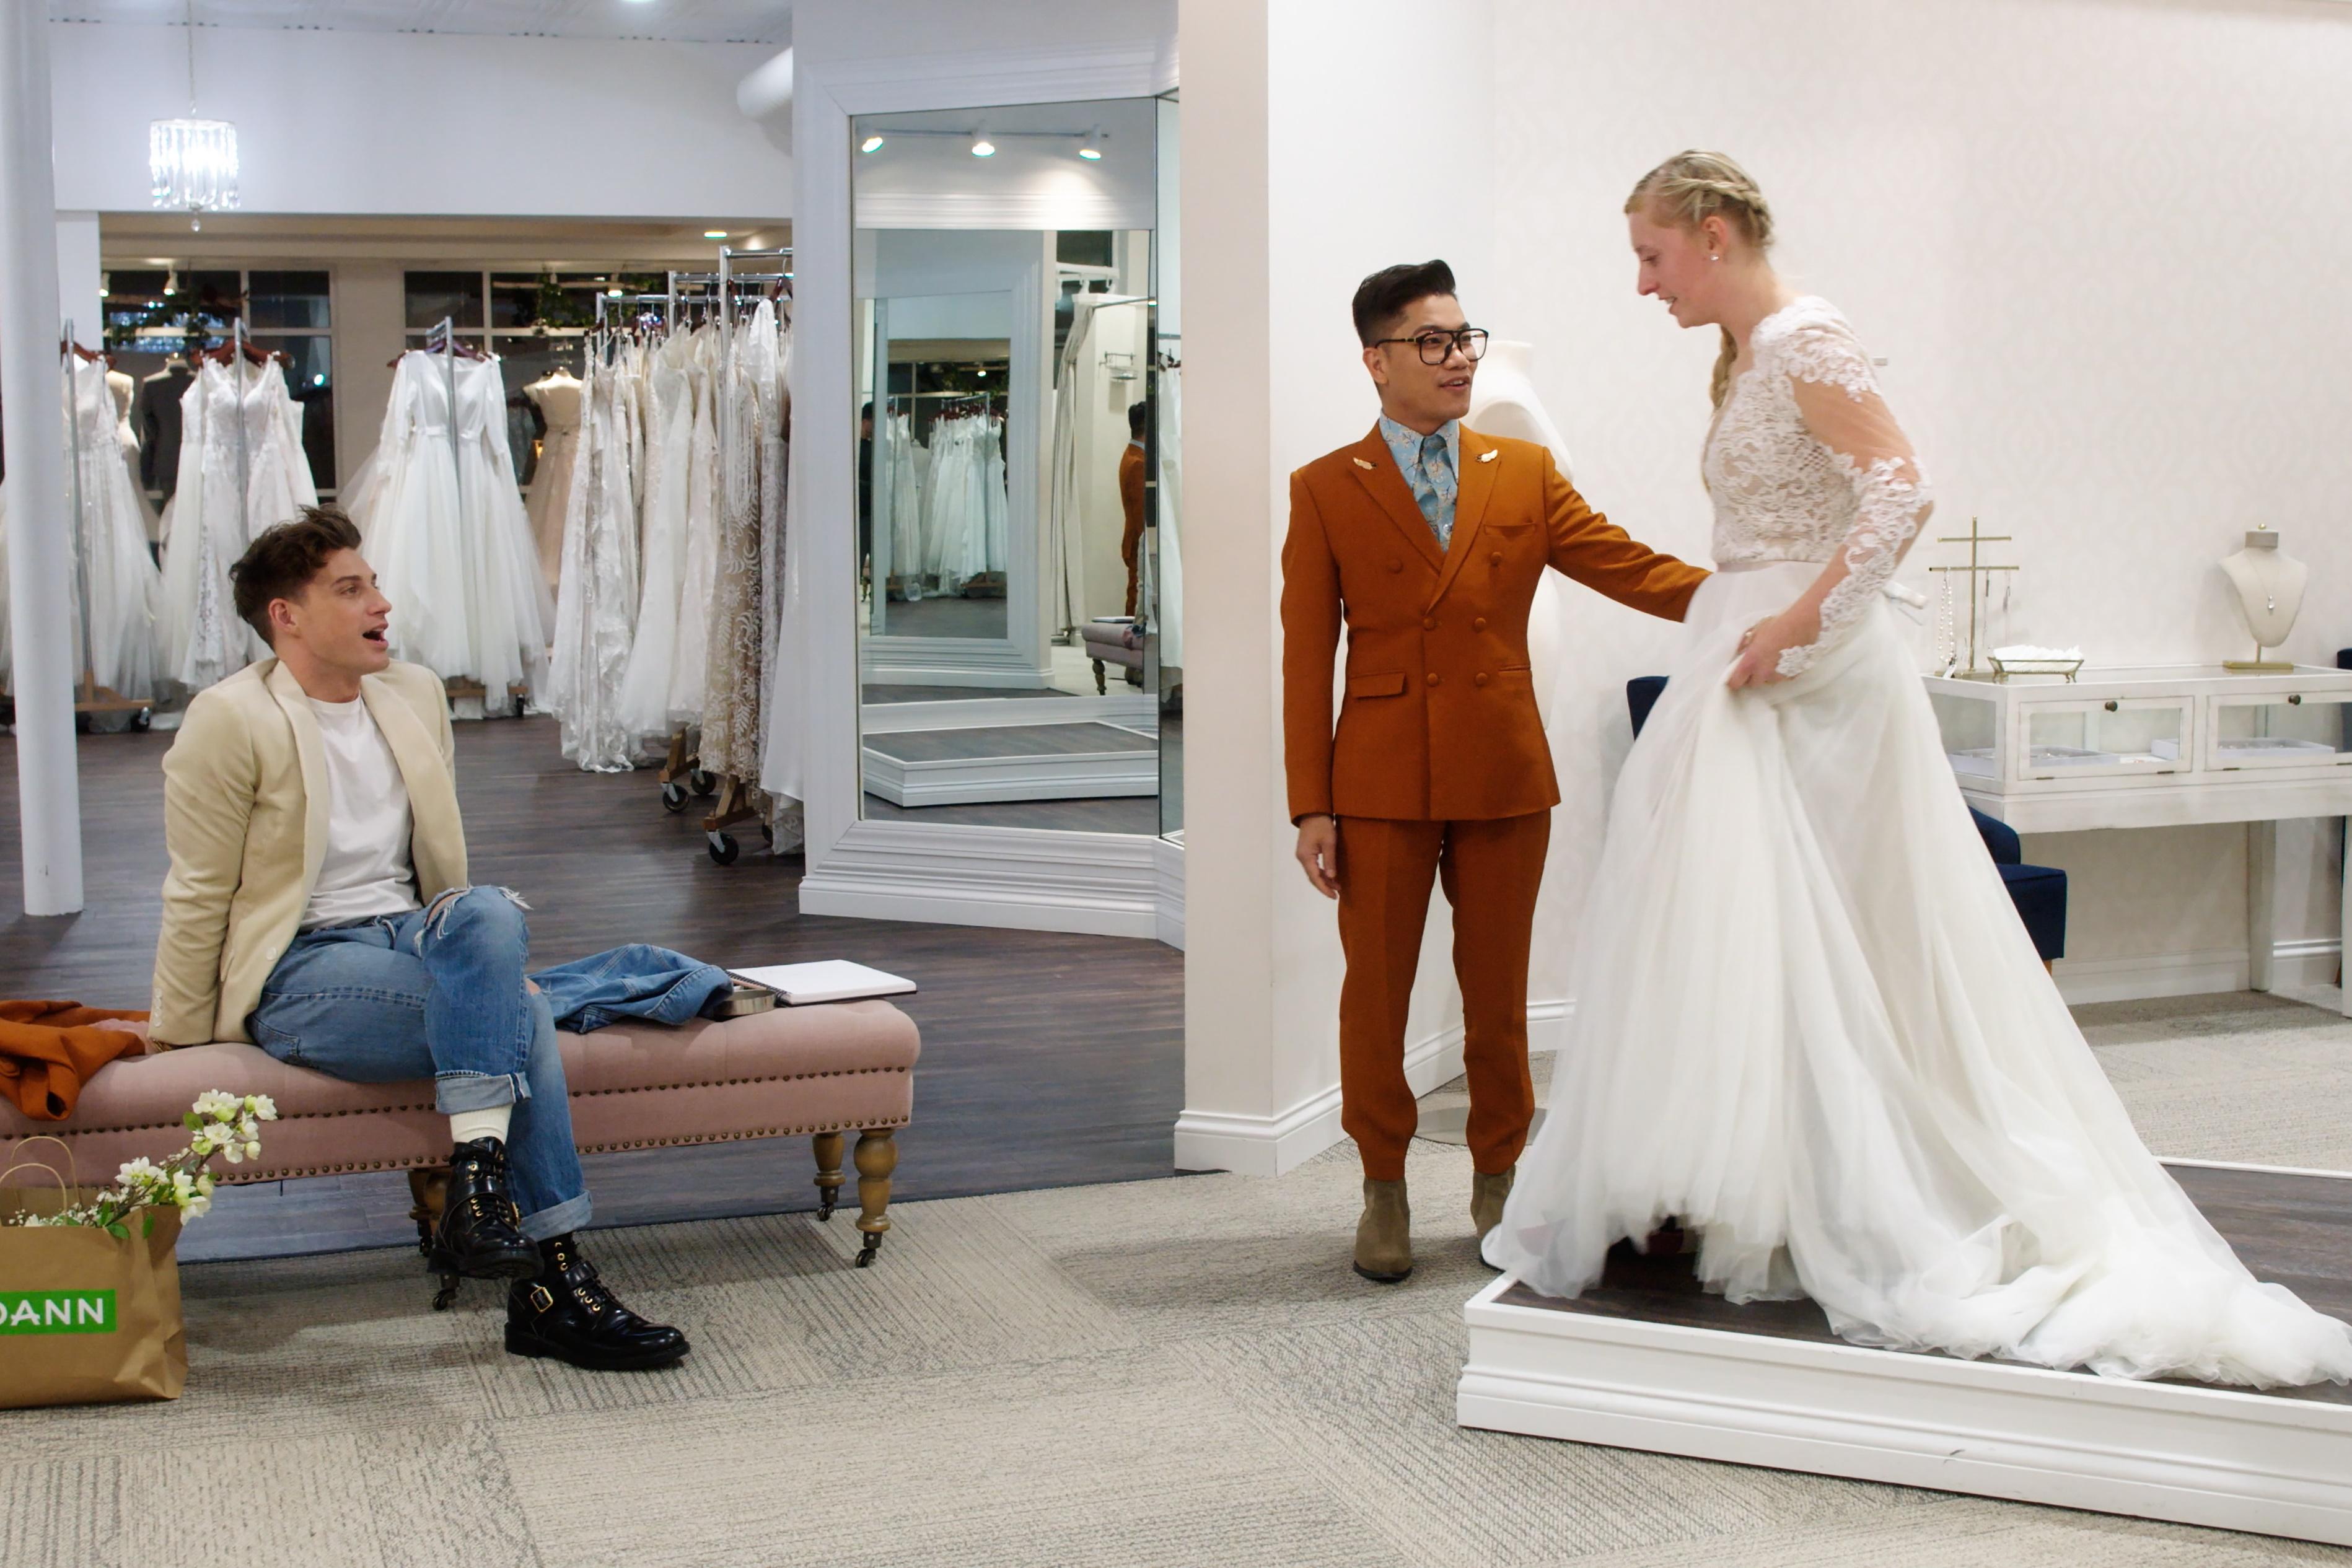 SAY-I-DO-L-to-R-Interior-designer-Jeremiah-Brent-and-fashion-designer-Thai-Nguyen-in-episode-8-of-SA